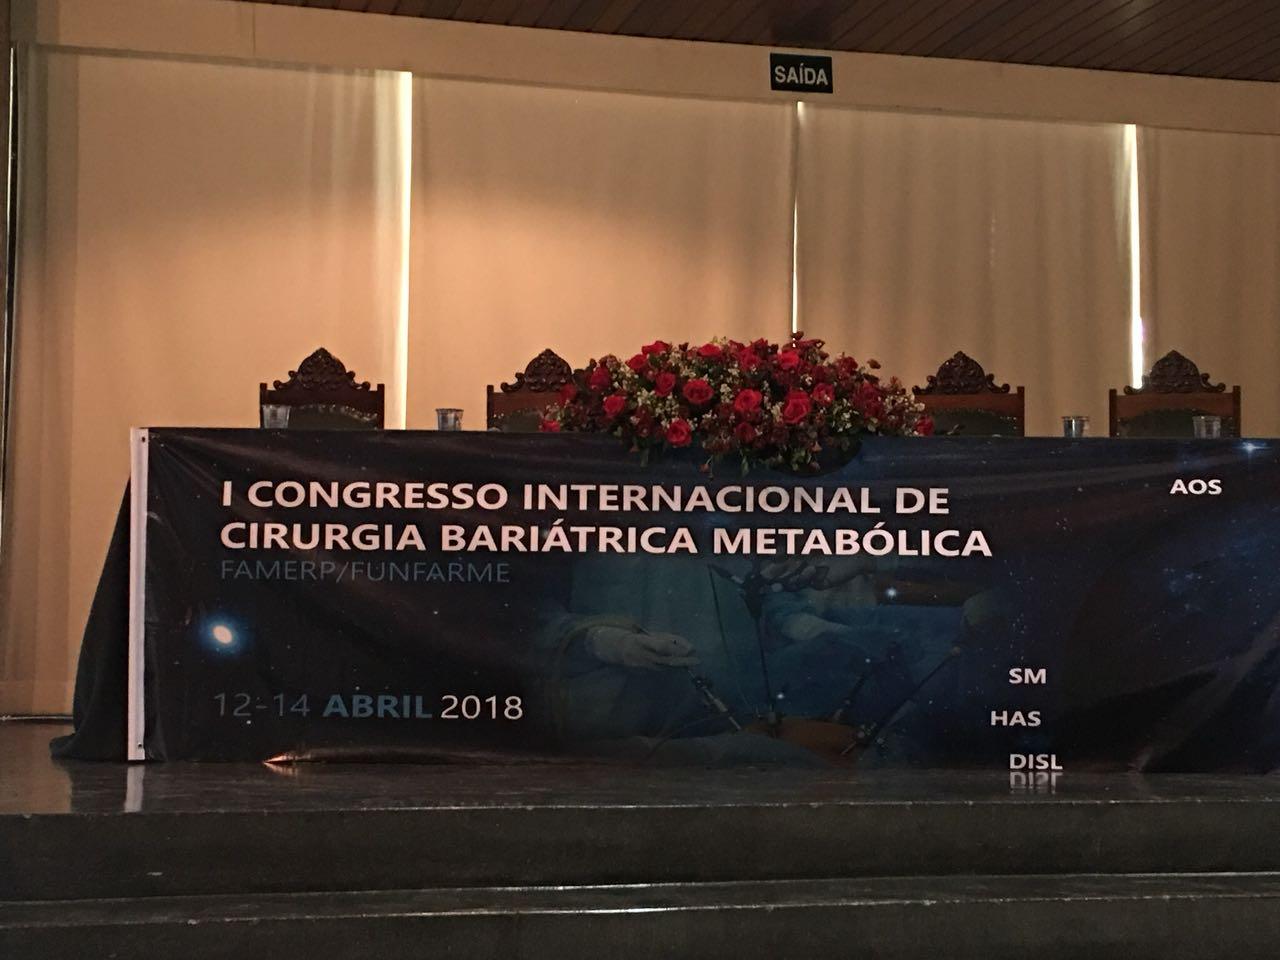 I Congresso Internacional de Cirurgia Bariátrica Metabólica FAMERP/FUNFARME